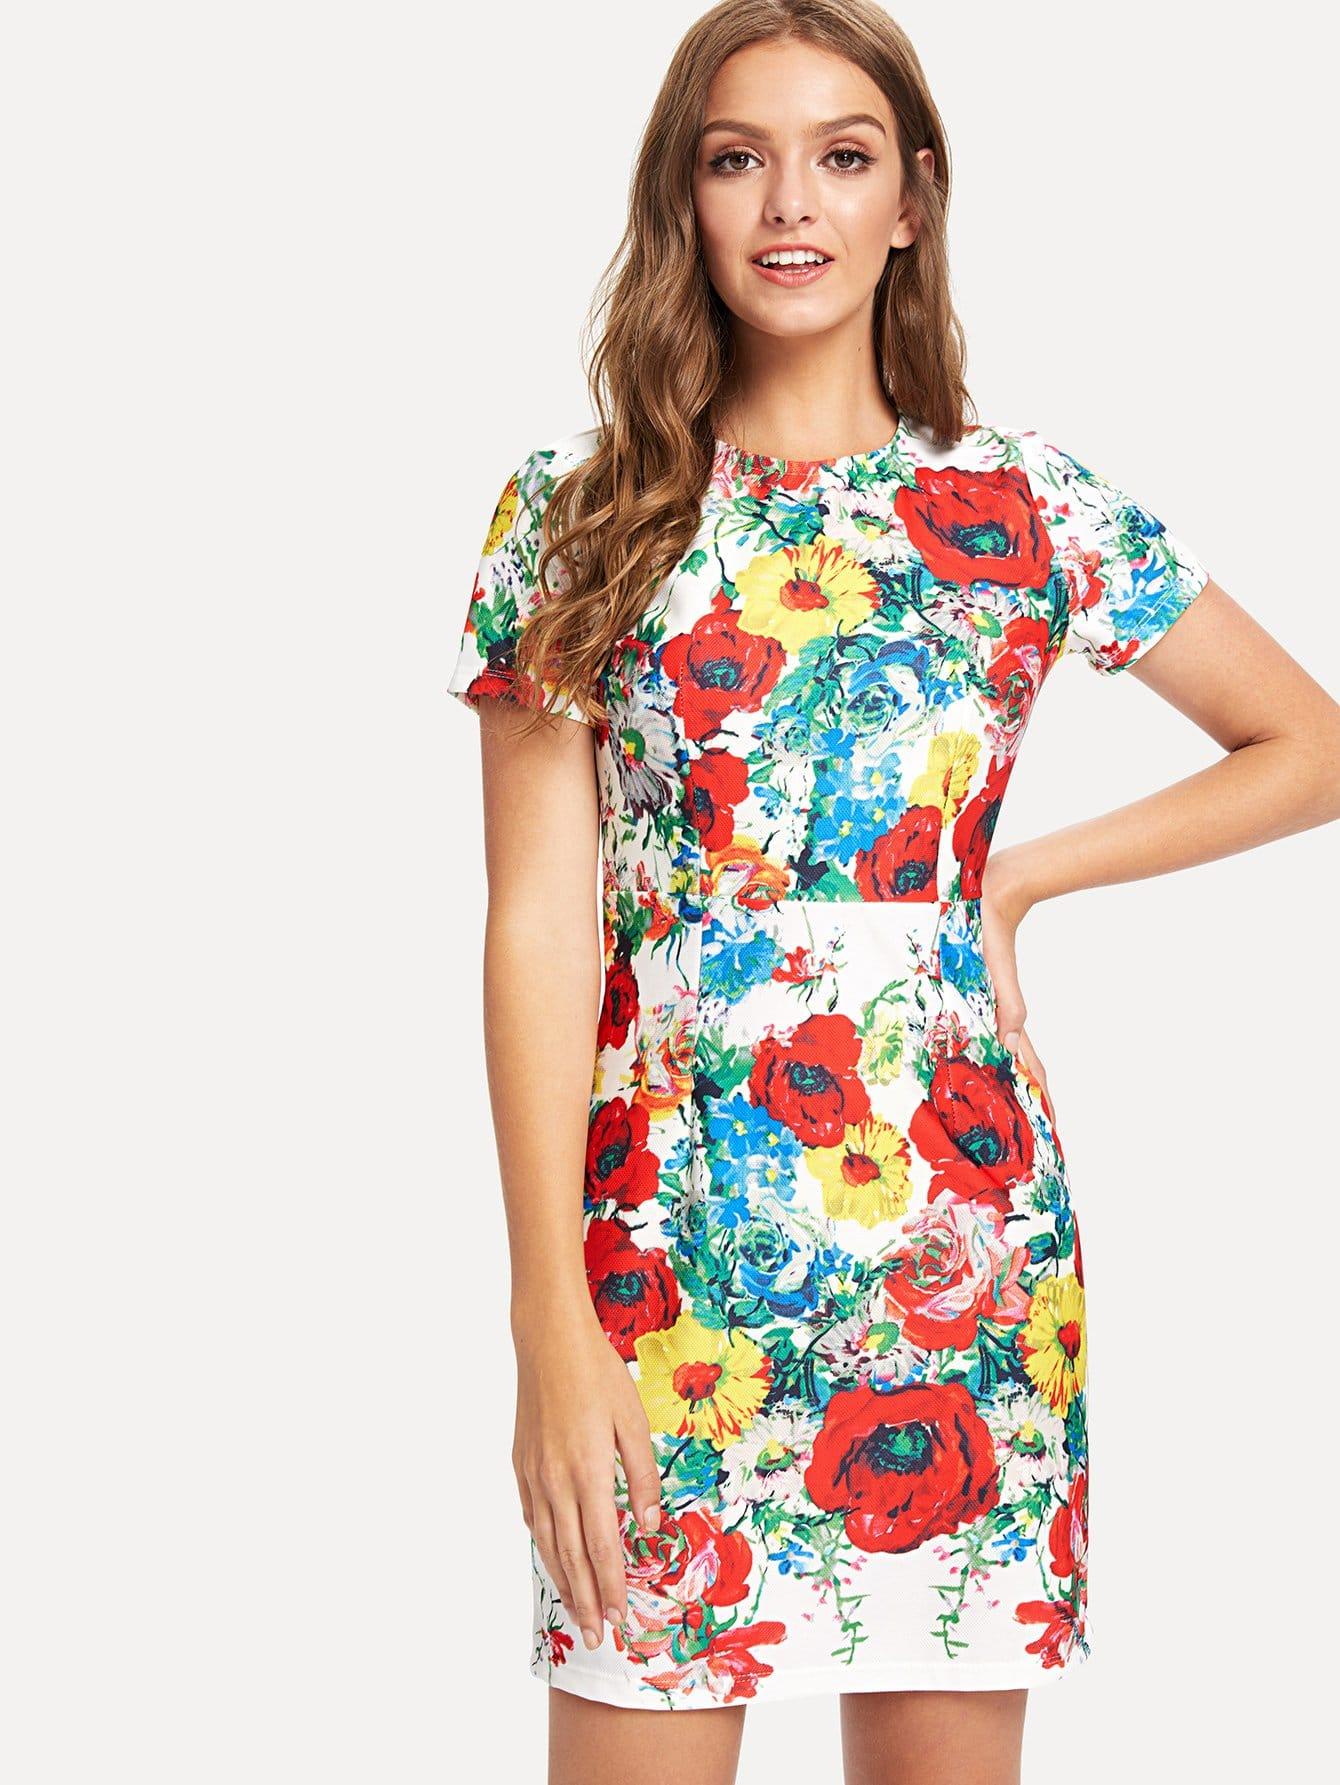 Botanical Print Dress scalloped edge botanical print dress